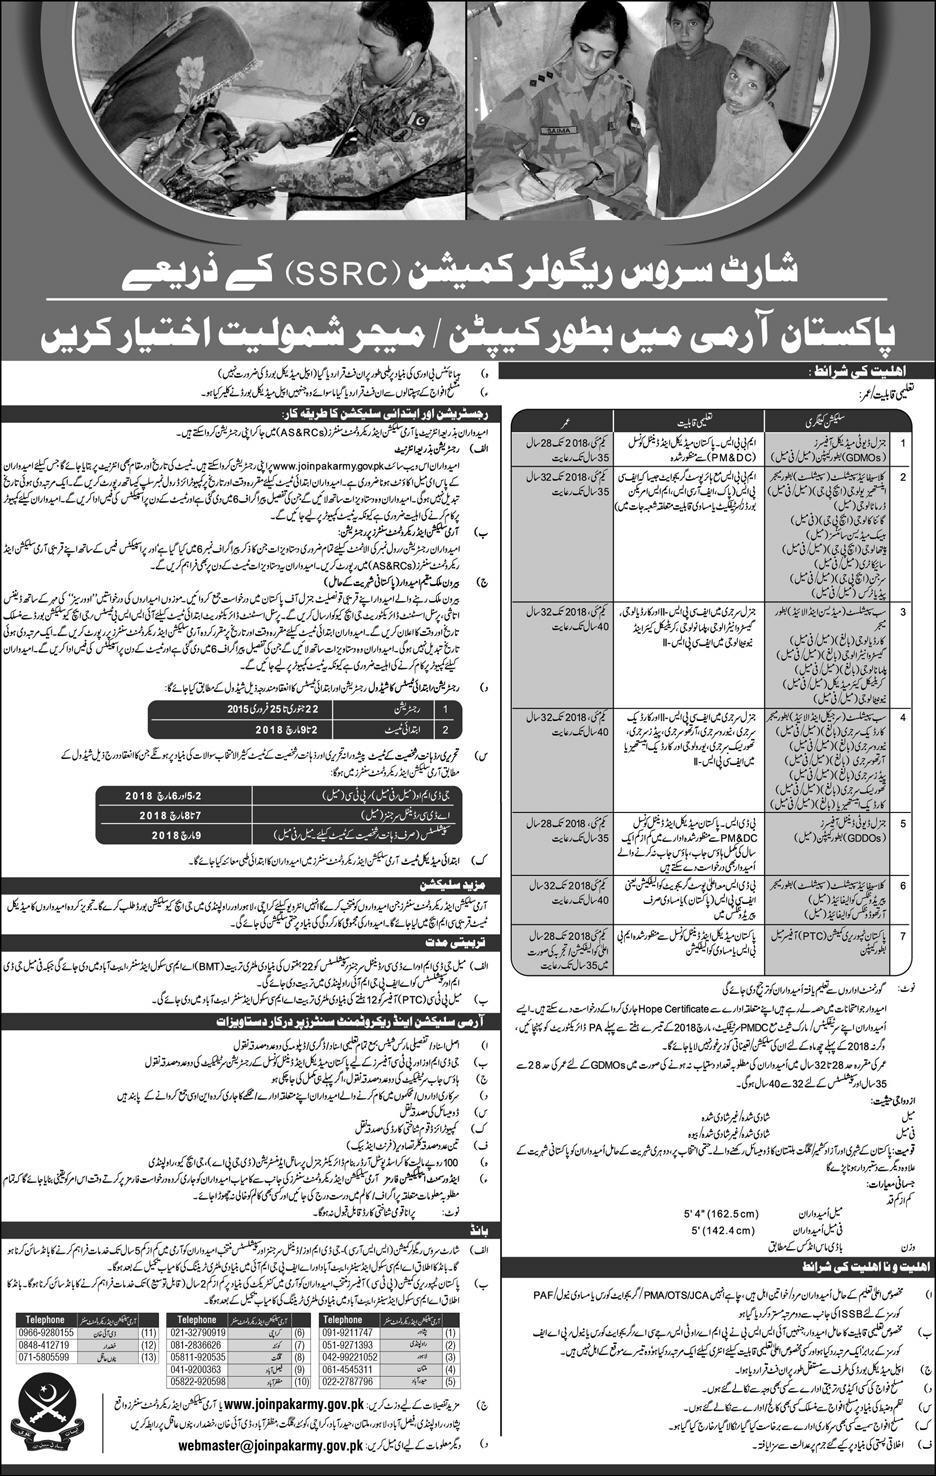 Recruitmentas Captain Through Service Commission in Pak Army